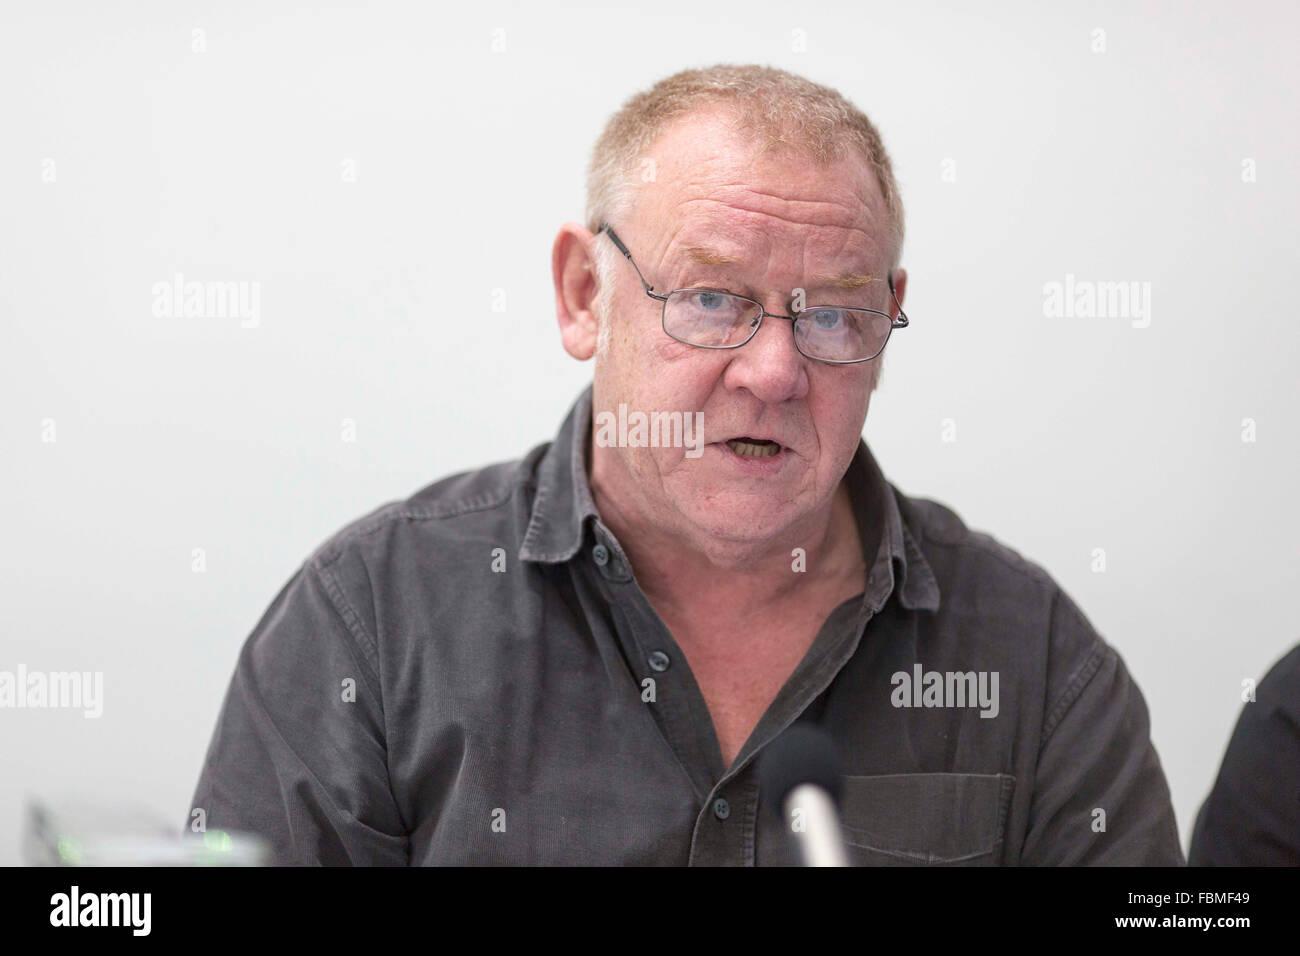 radio DJ and presenter Allan Beswick - Stock Image